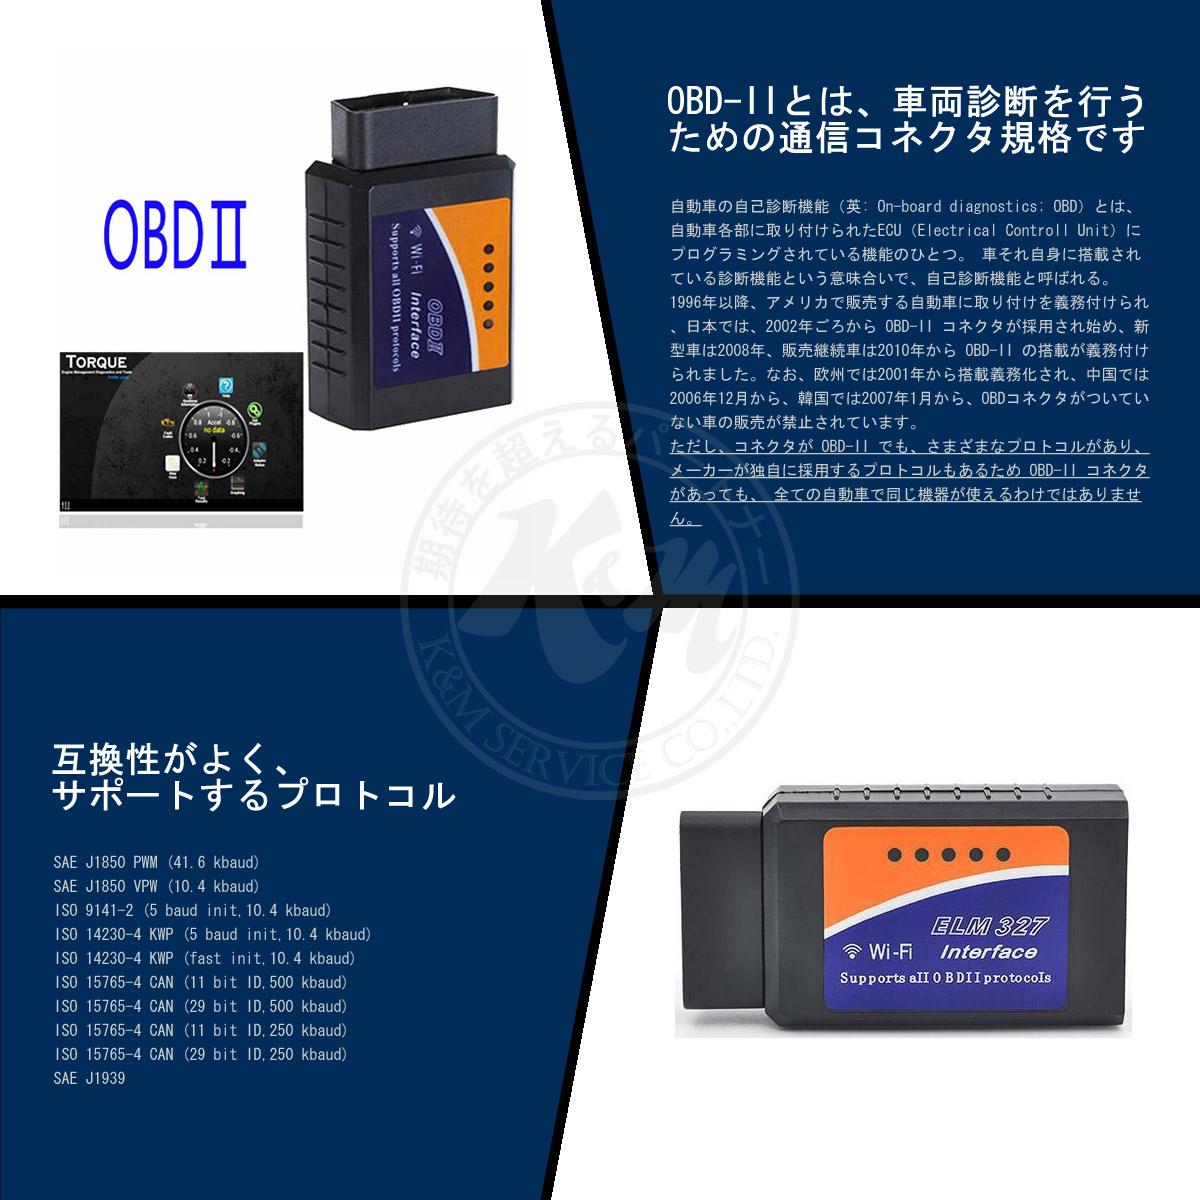 OBD2-ELM327-WIFI